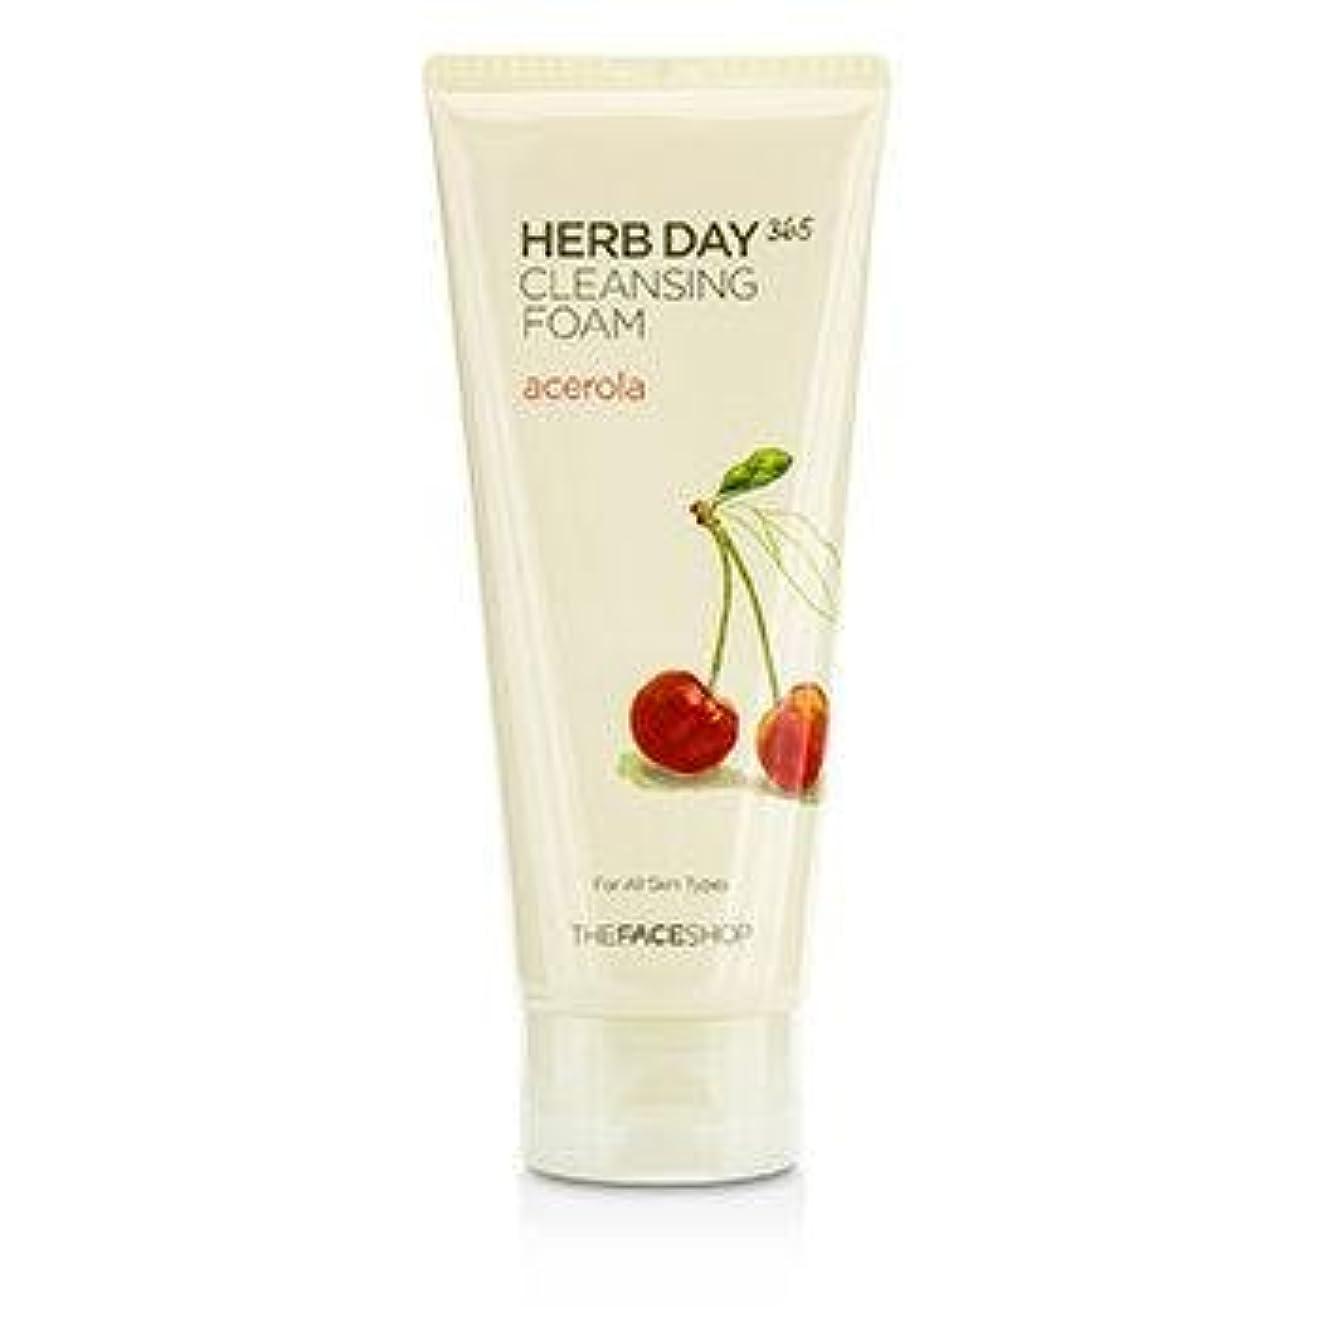 買収付添人乱闘THE FACE SHOP Herb Day 365 Cleansing Foam Acerola (並行輸入品)